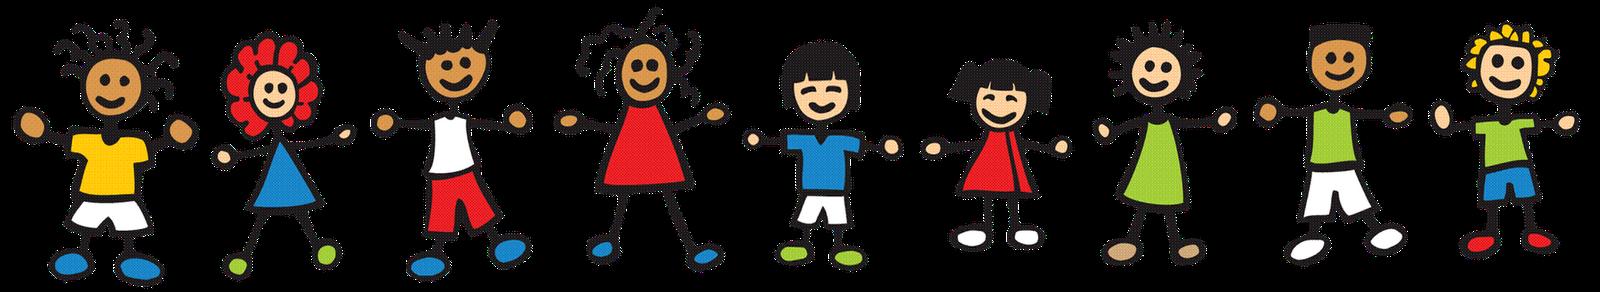 Kids clipart friendship.  collection of children